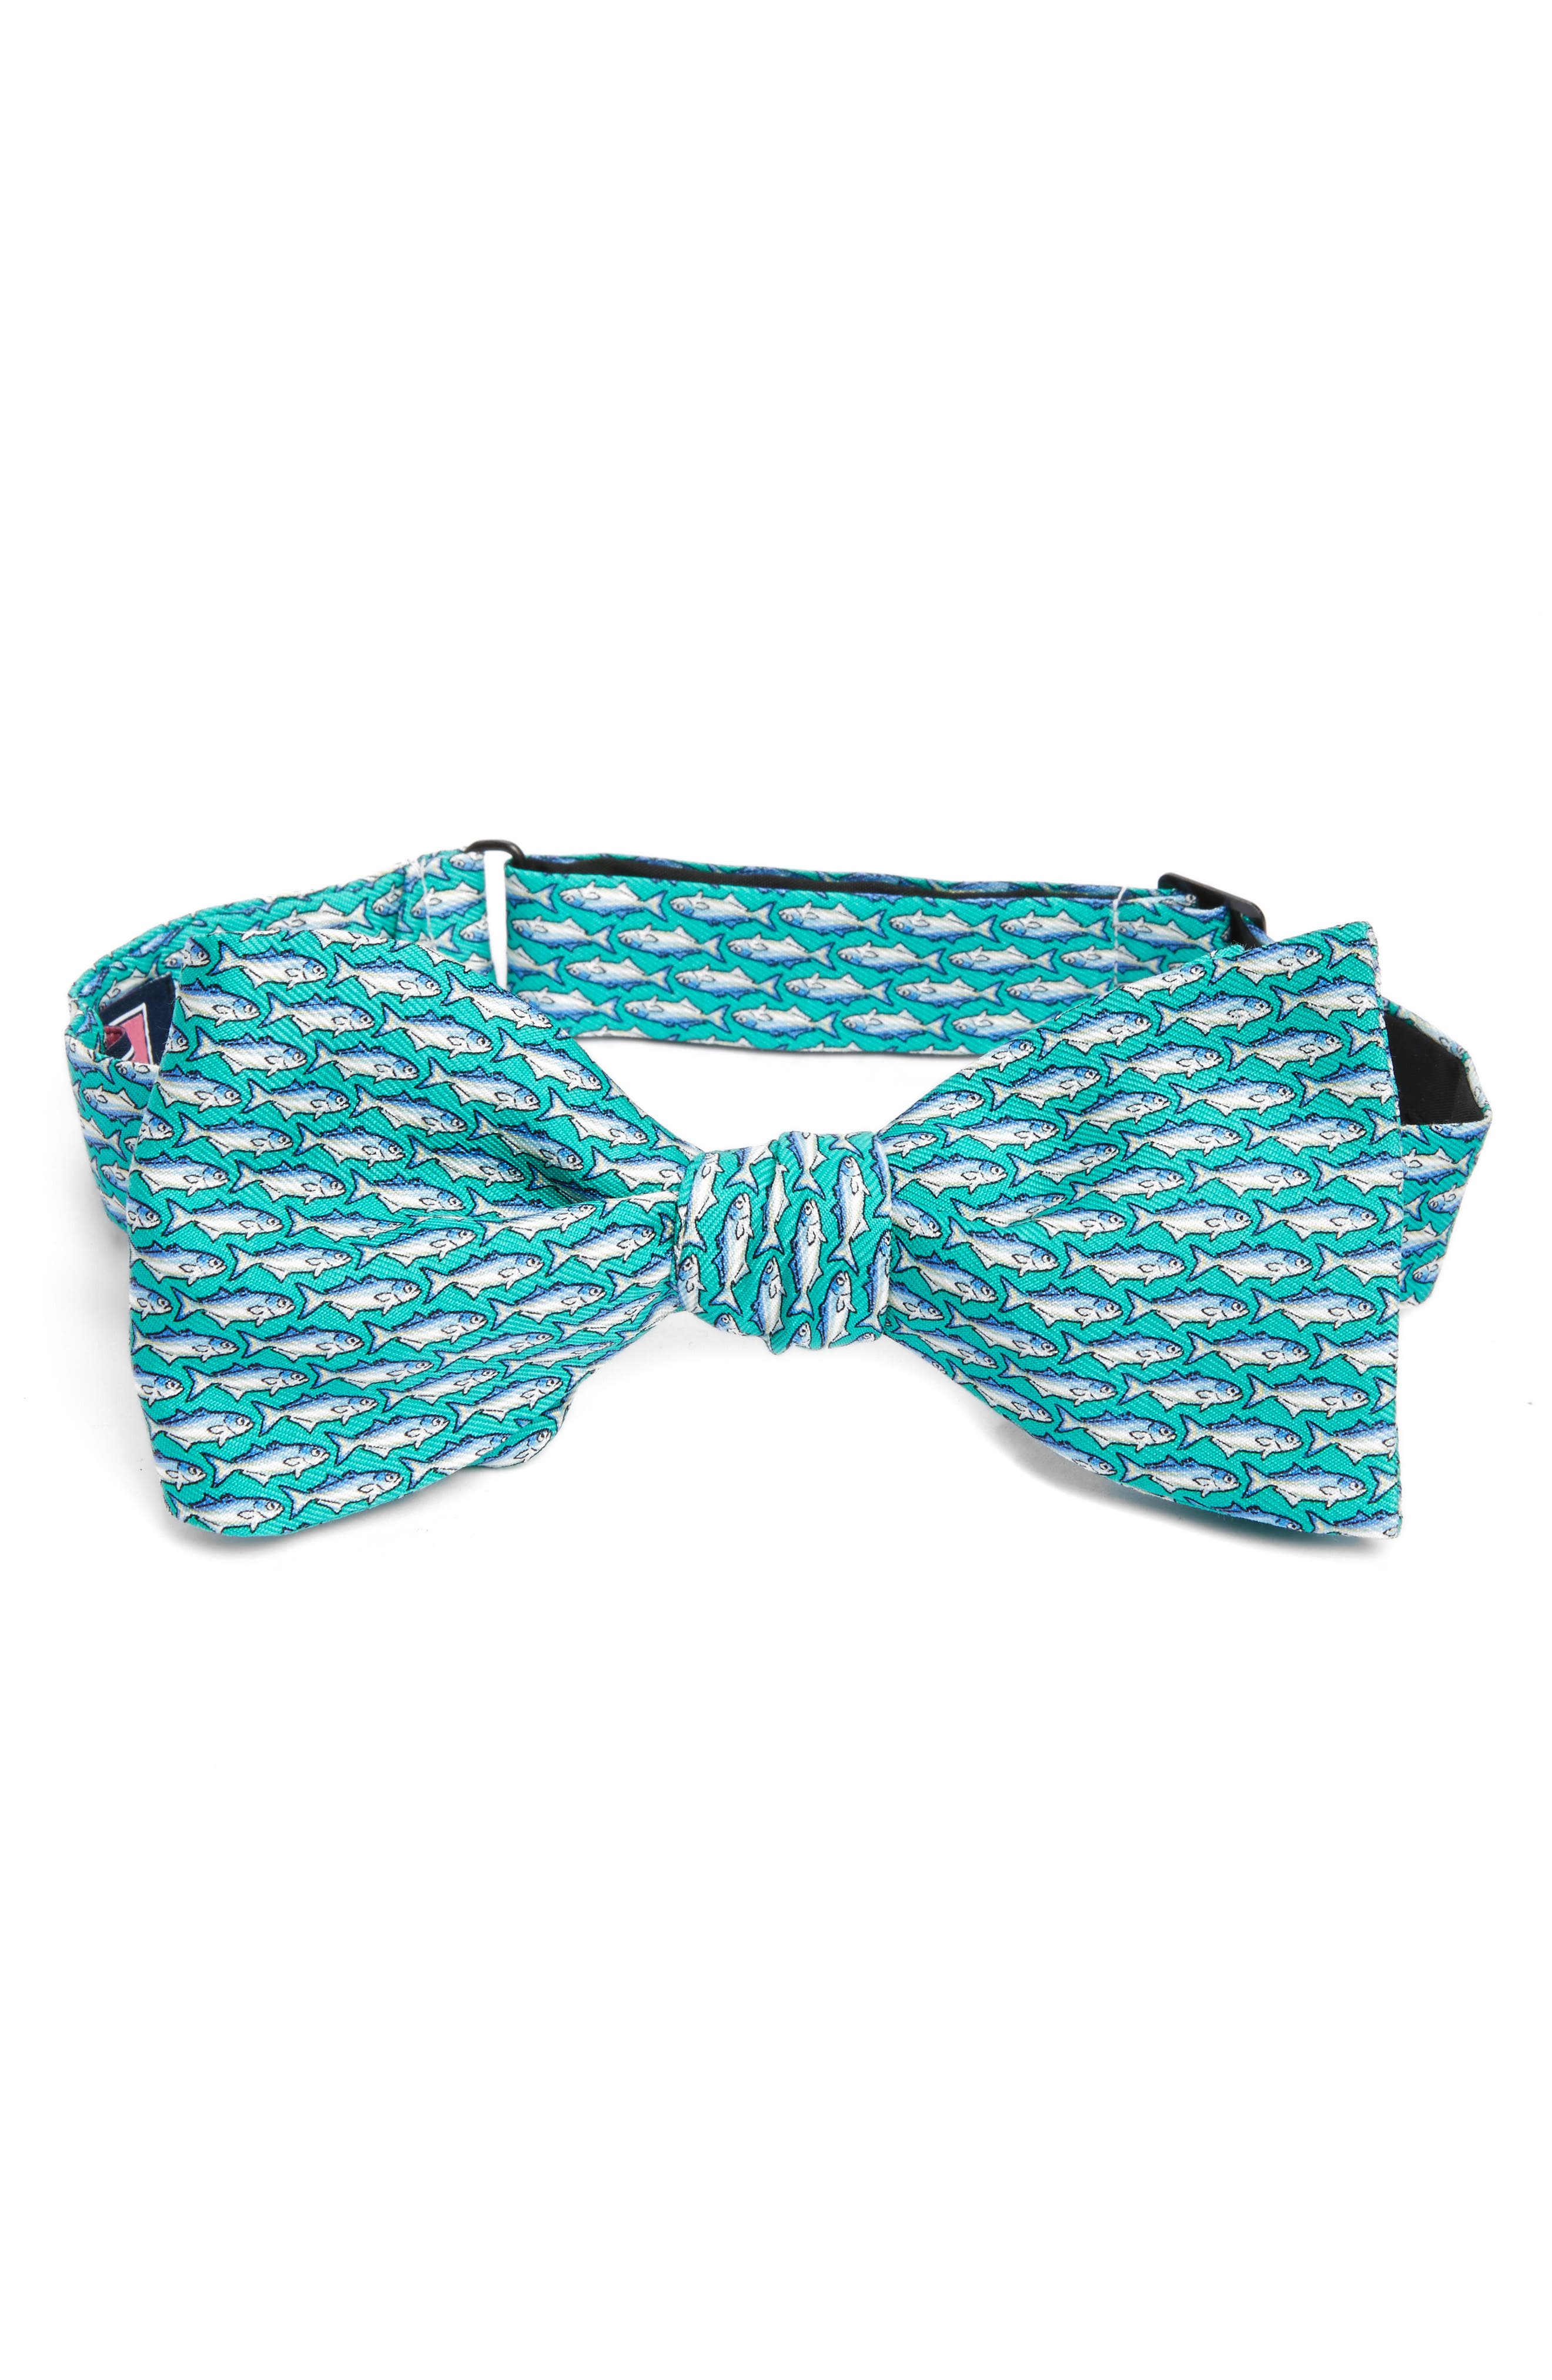 Vineyard Vines Blue Fish Print Silk Bow Tie